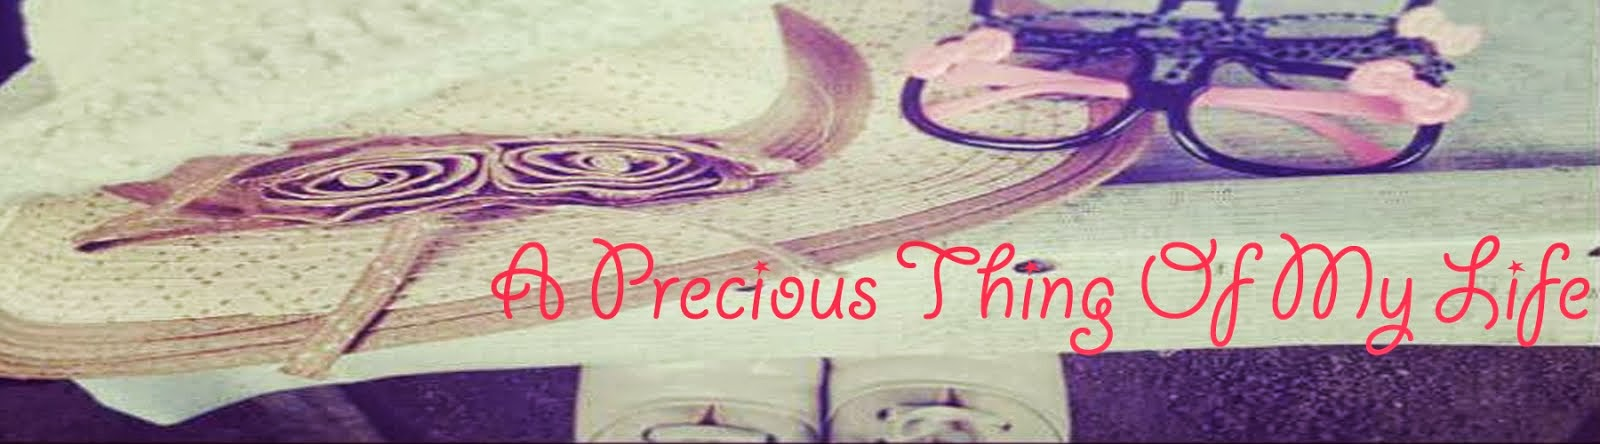 my most precious possession